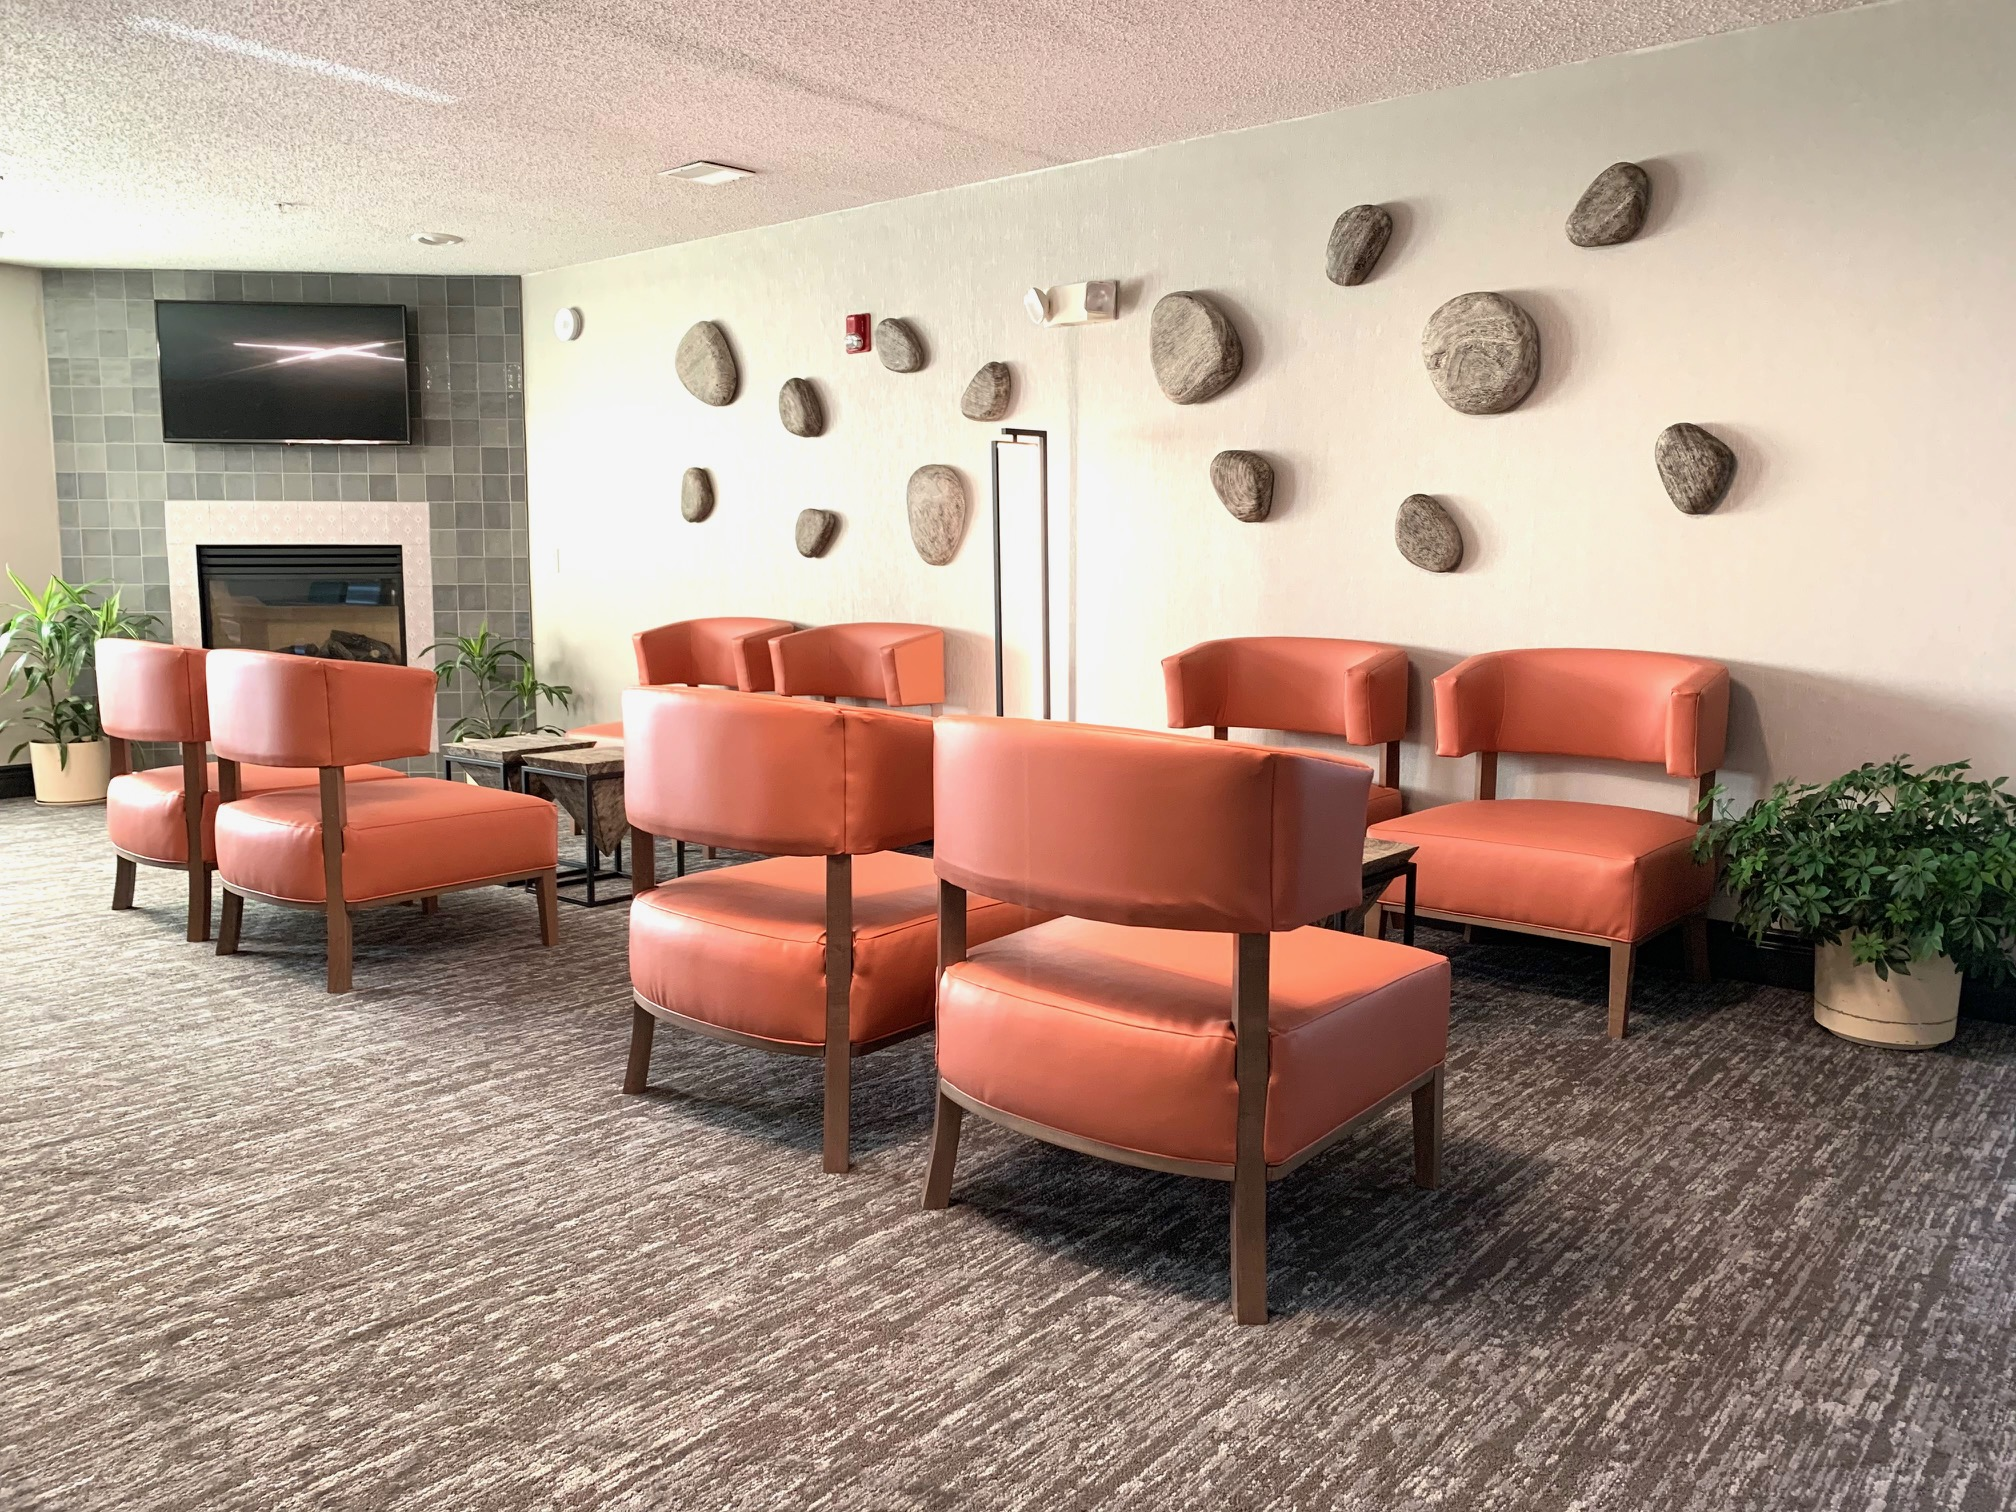 /best-western-oswego-hotel-completes-renovation